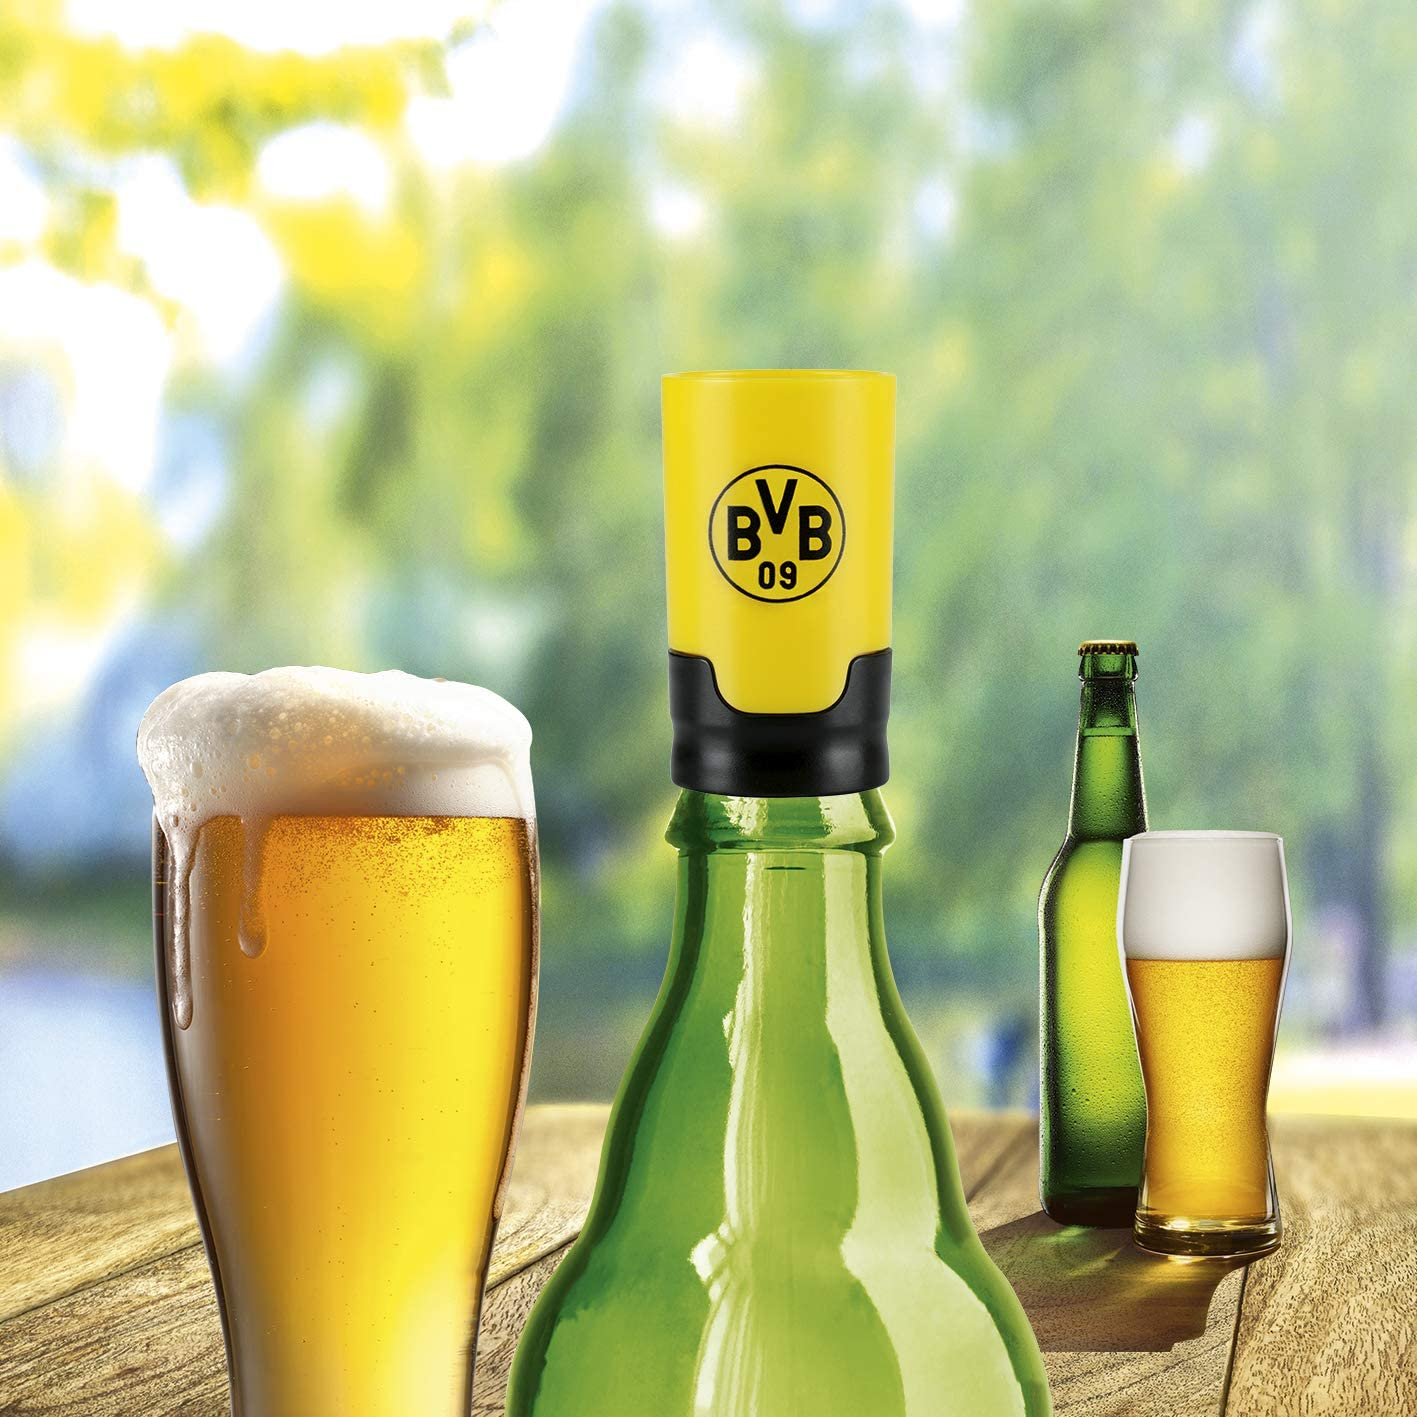 Bars Usw. Geschäftstreffen youngfate Beer Foamer Flaschenaufsatz ...